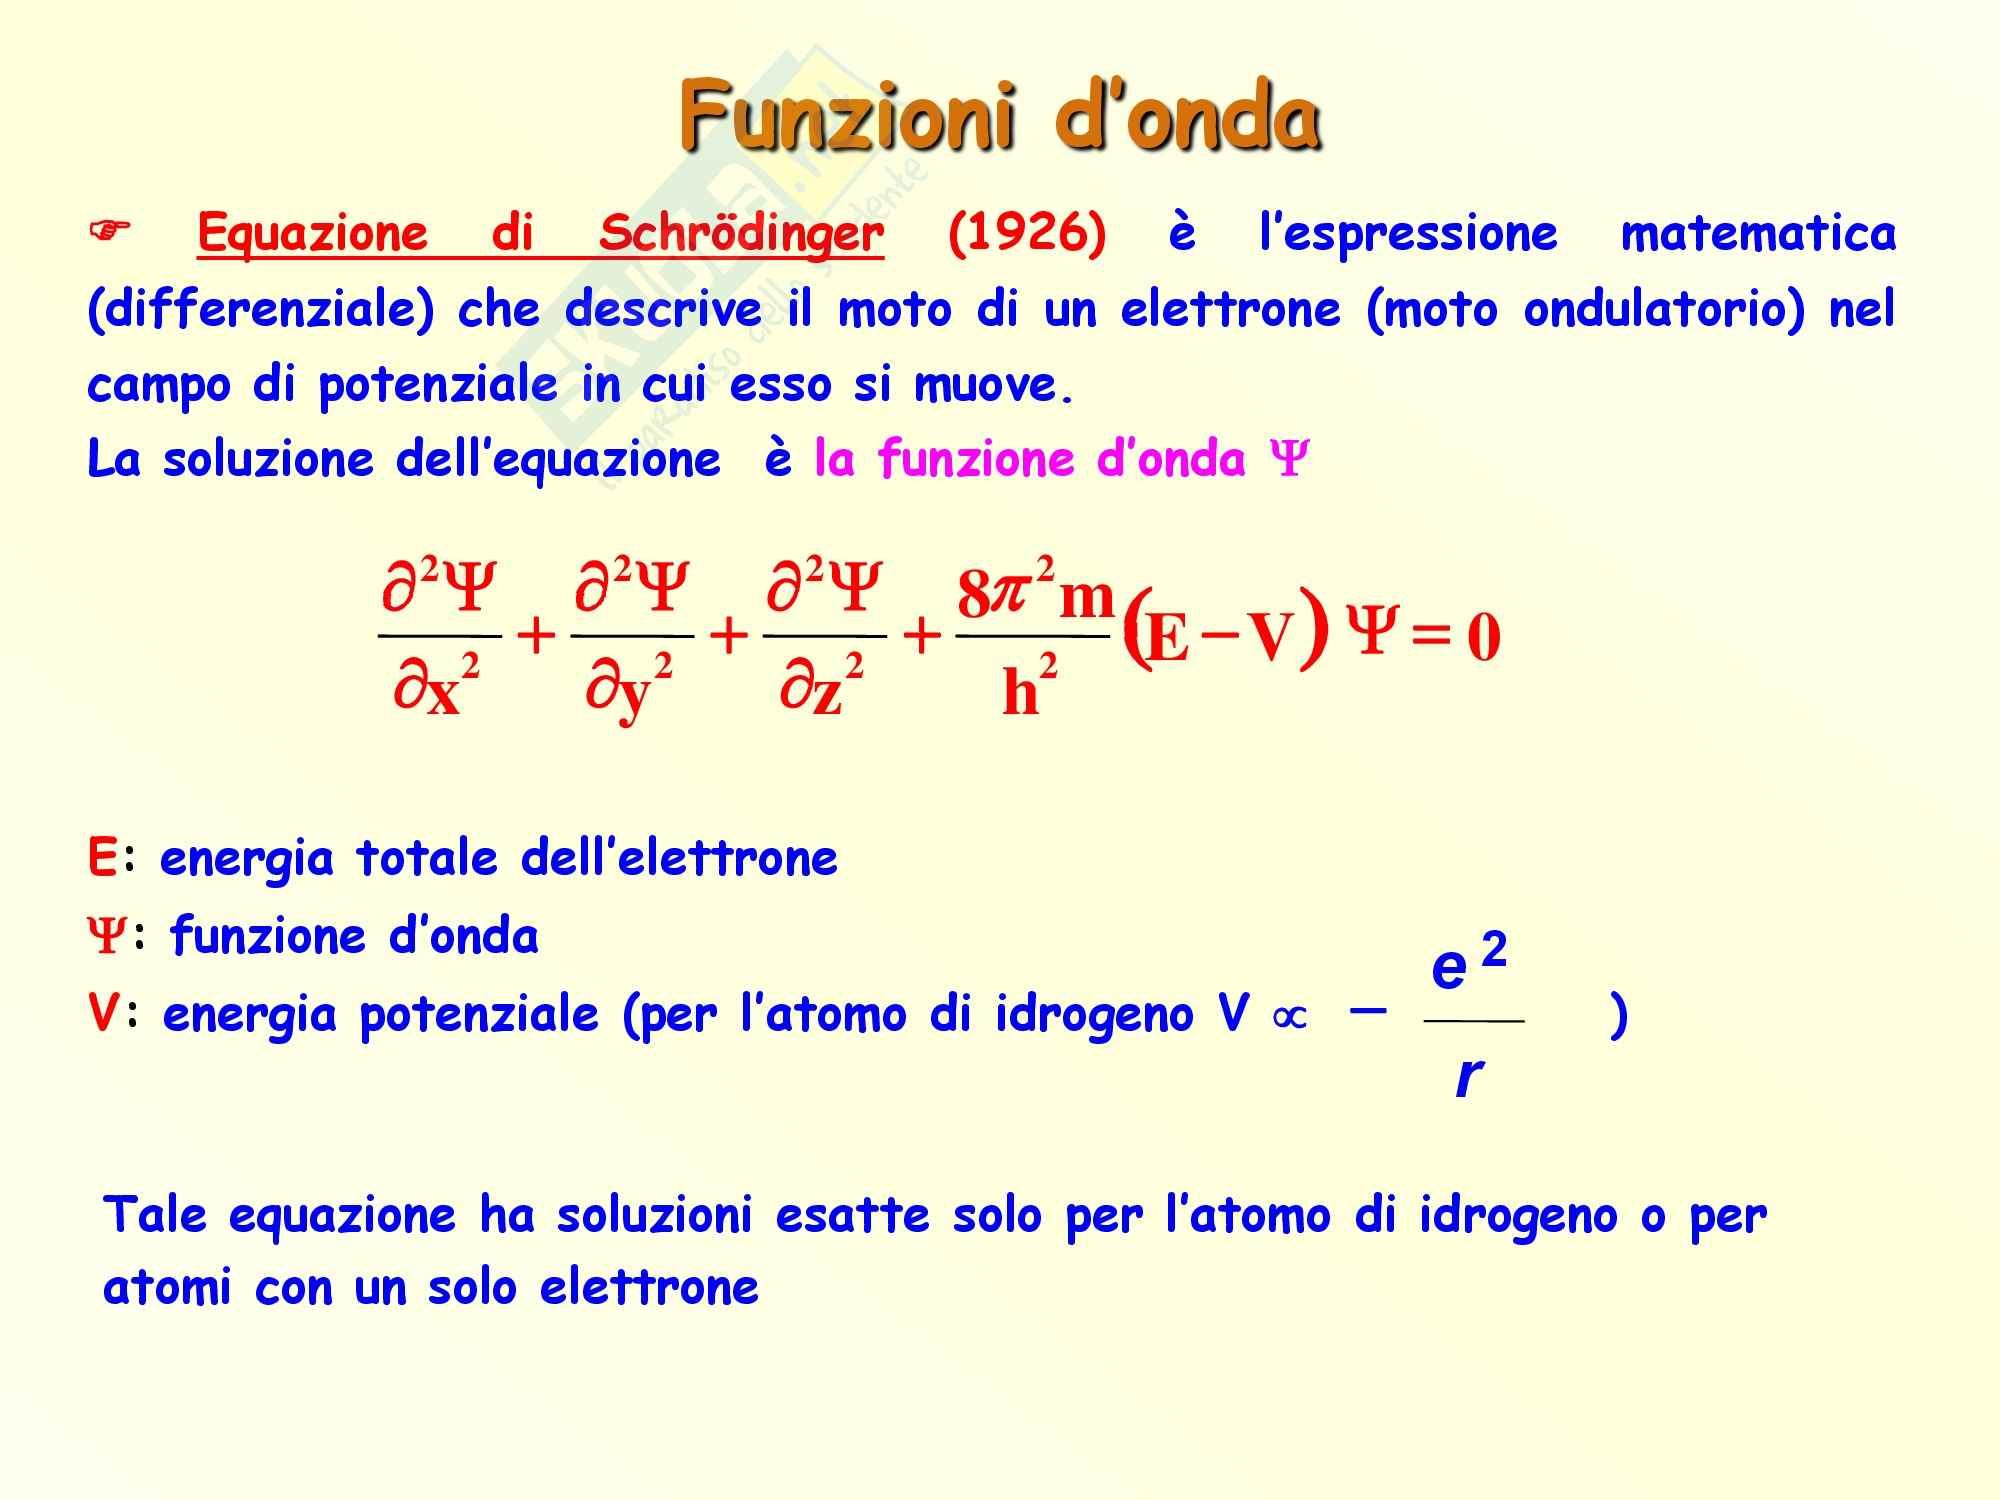 Chimica inorganica - numeri quantici e funzioni d'onda